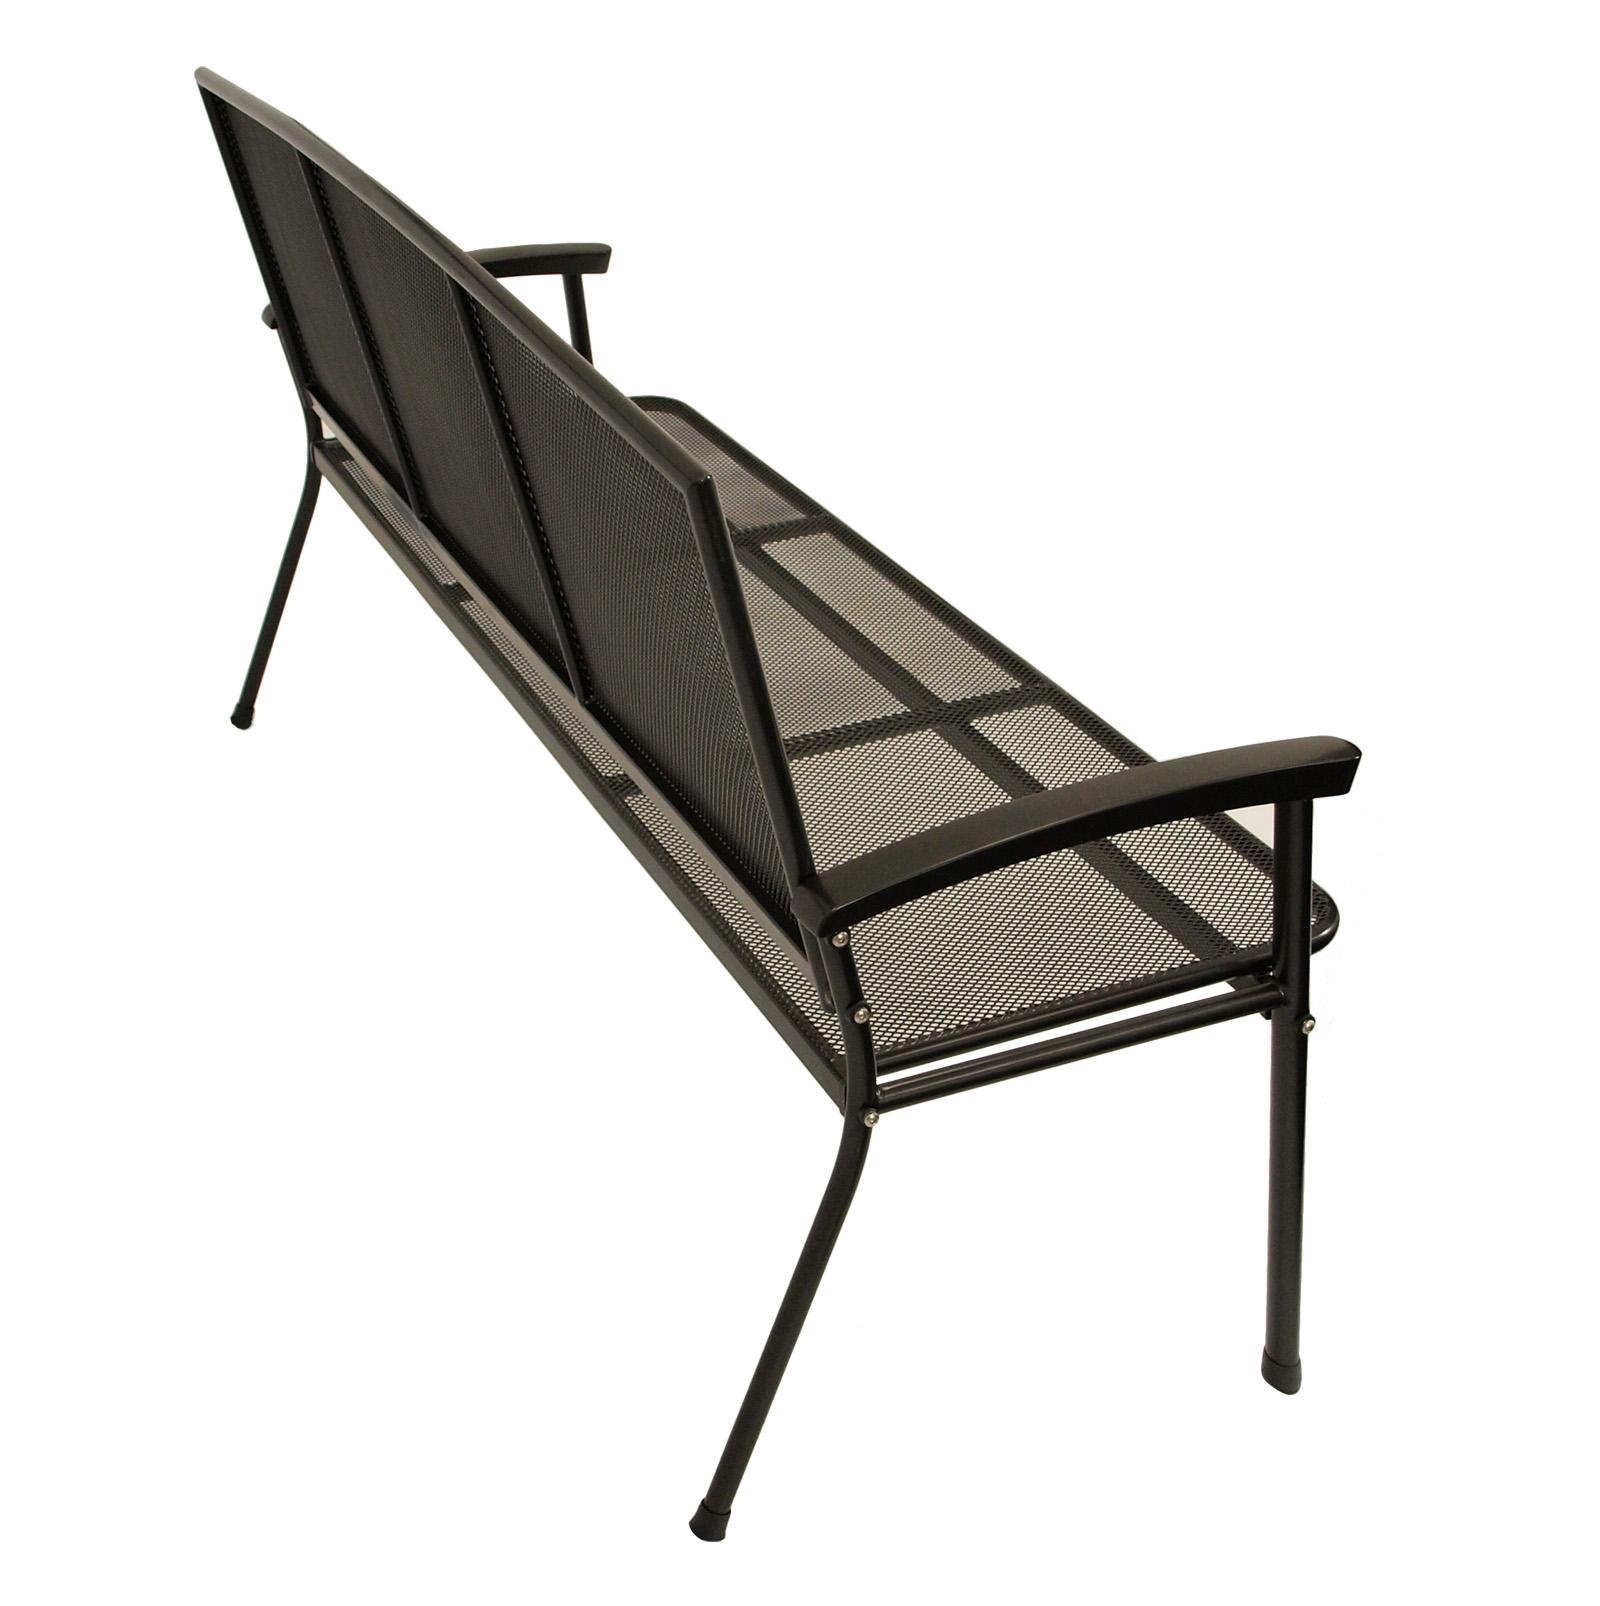 gartenbank metallbank gartenm bel bank metall rivo 3 sitzer eisen metall grau 4050747130627 ebay. Black Bedroom Furniture Sets. Home Design Ideas